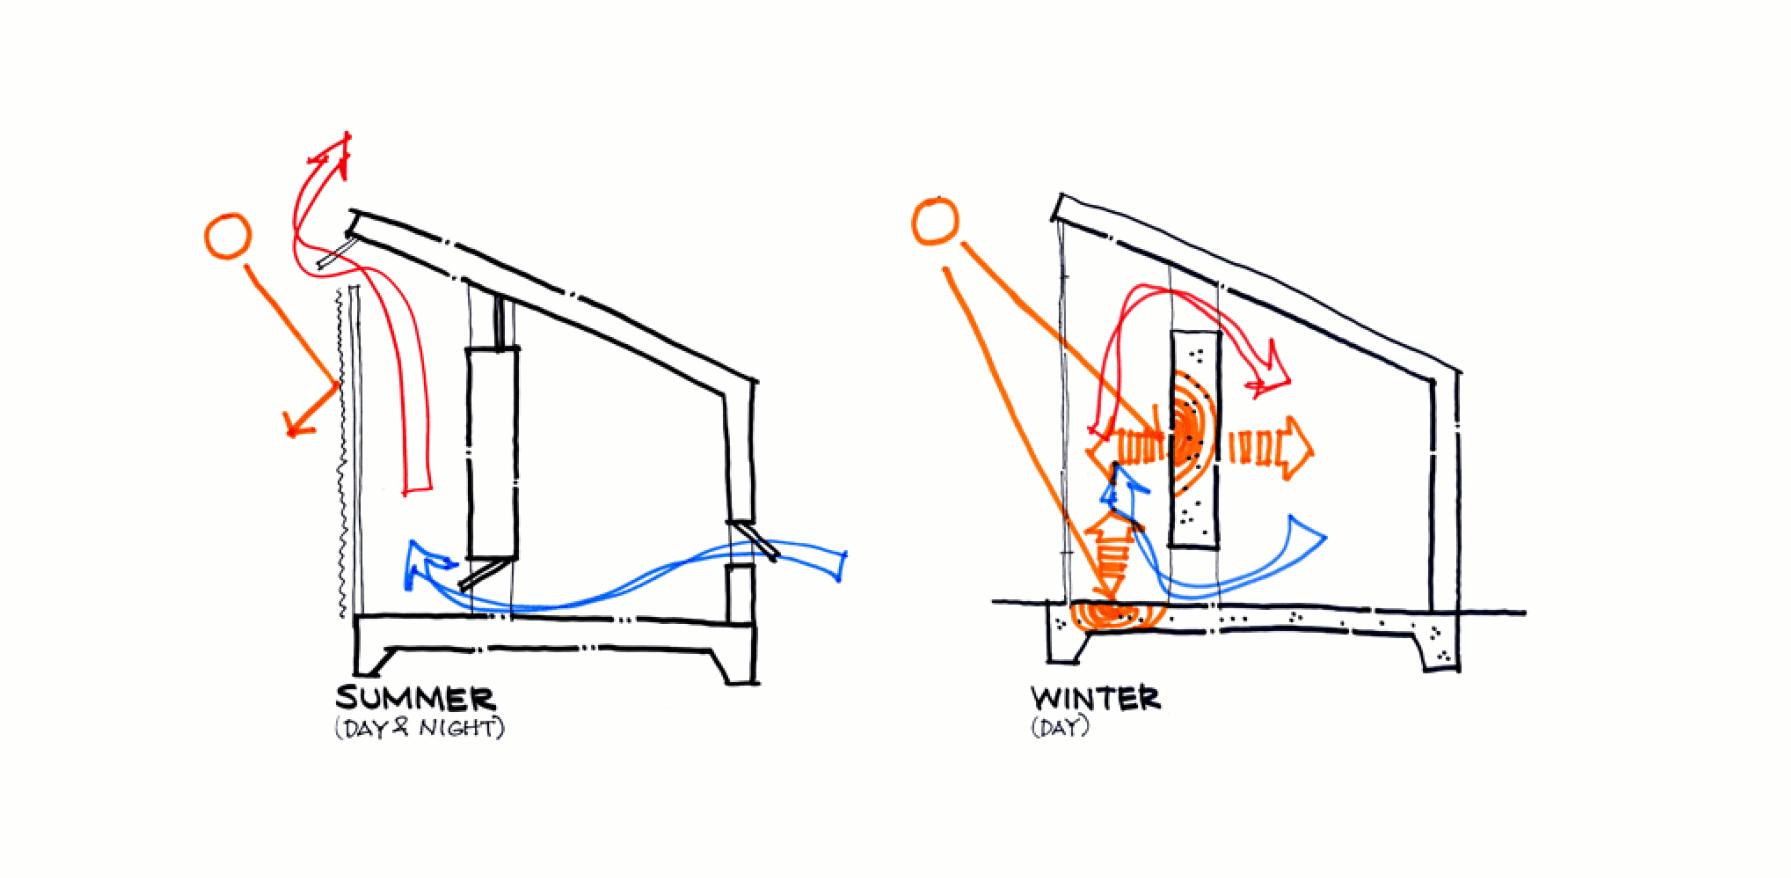 Winter / Summer heat diagram